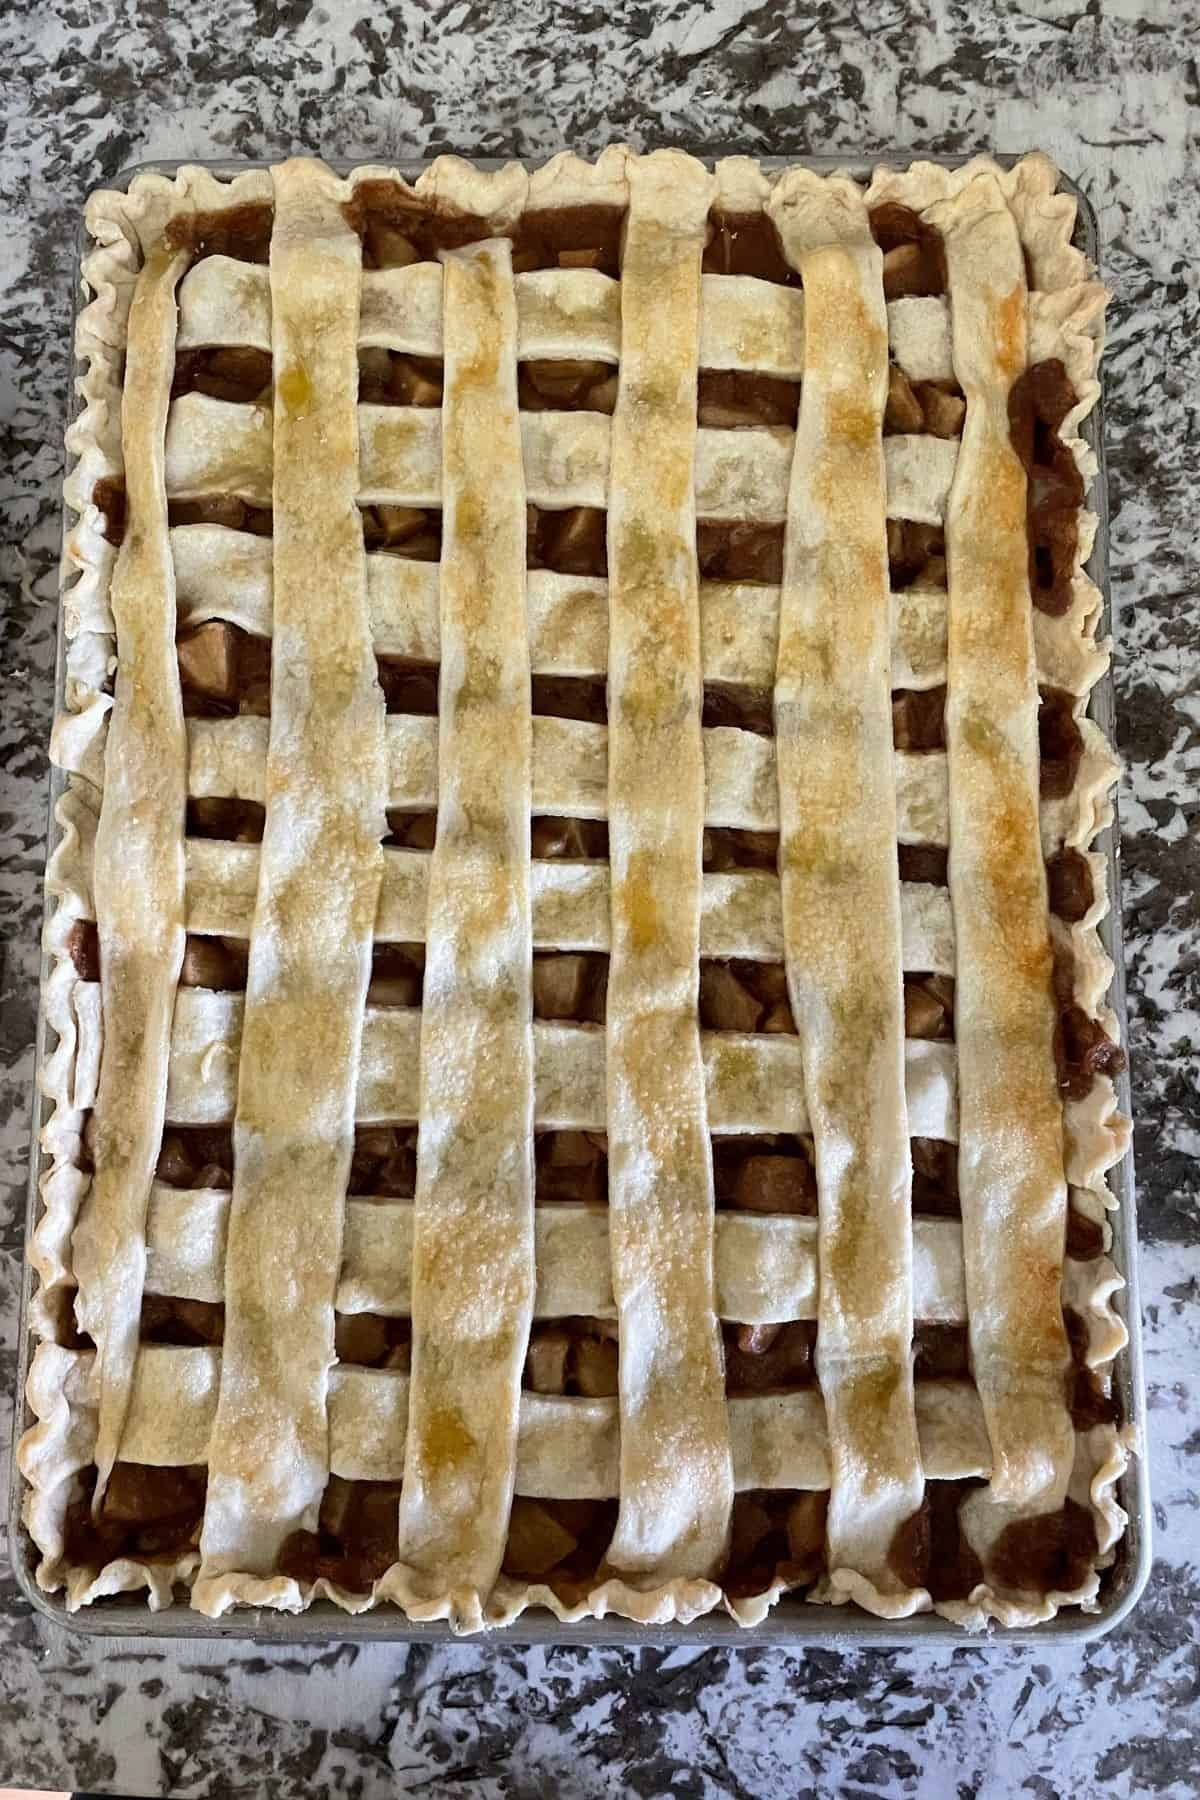 baked apple slab pie with lattice top